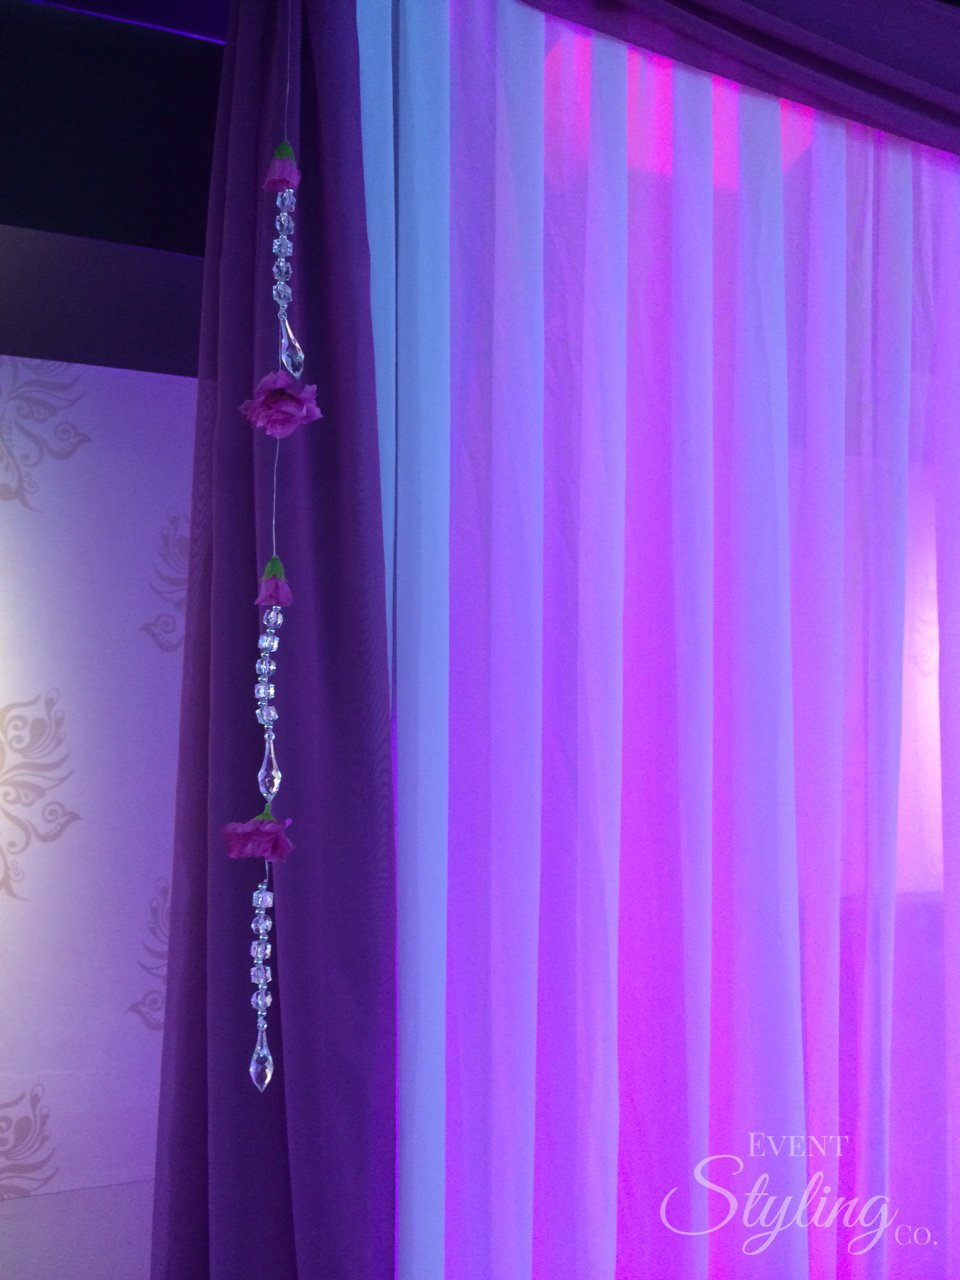 Arabian, Moroccan, Bollywood Theme backdrop